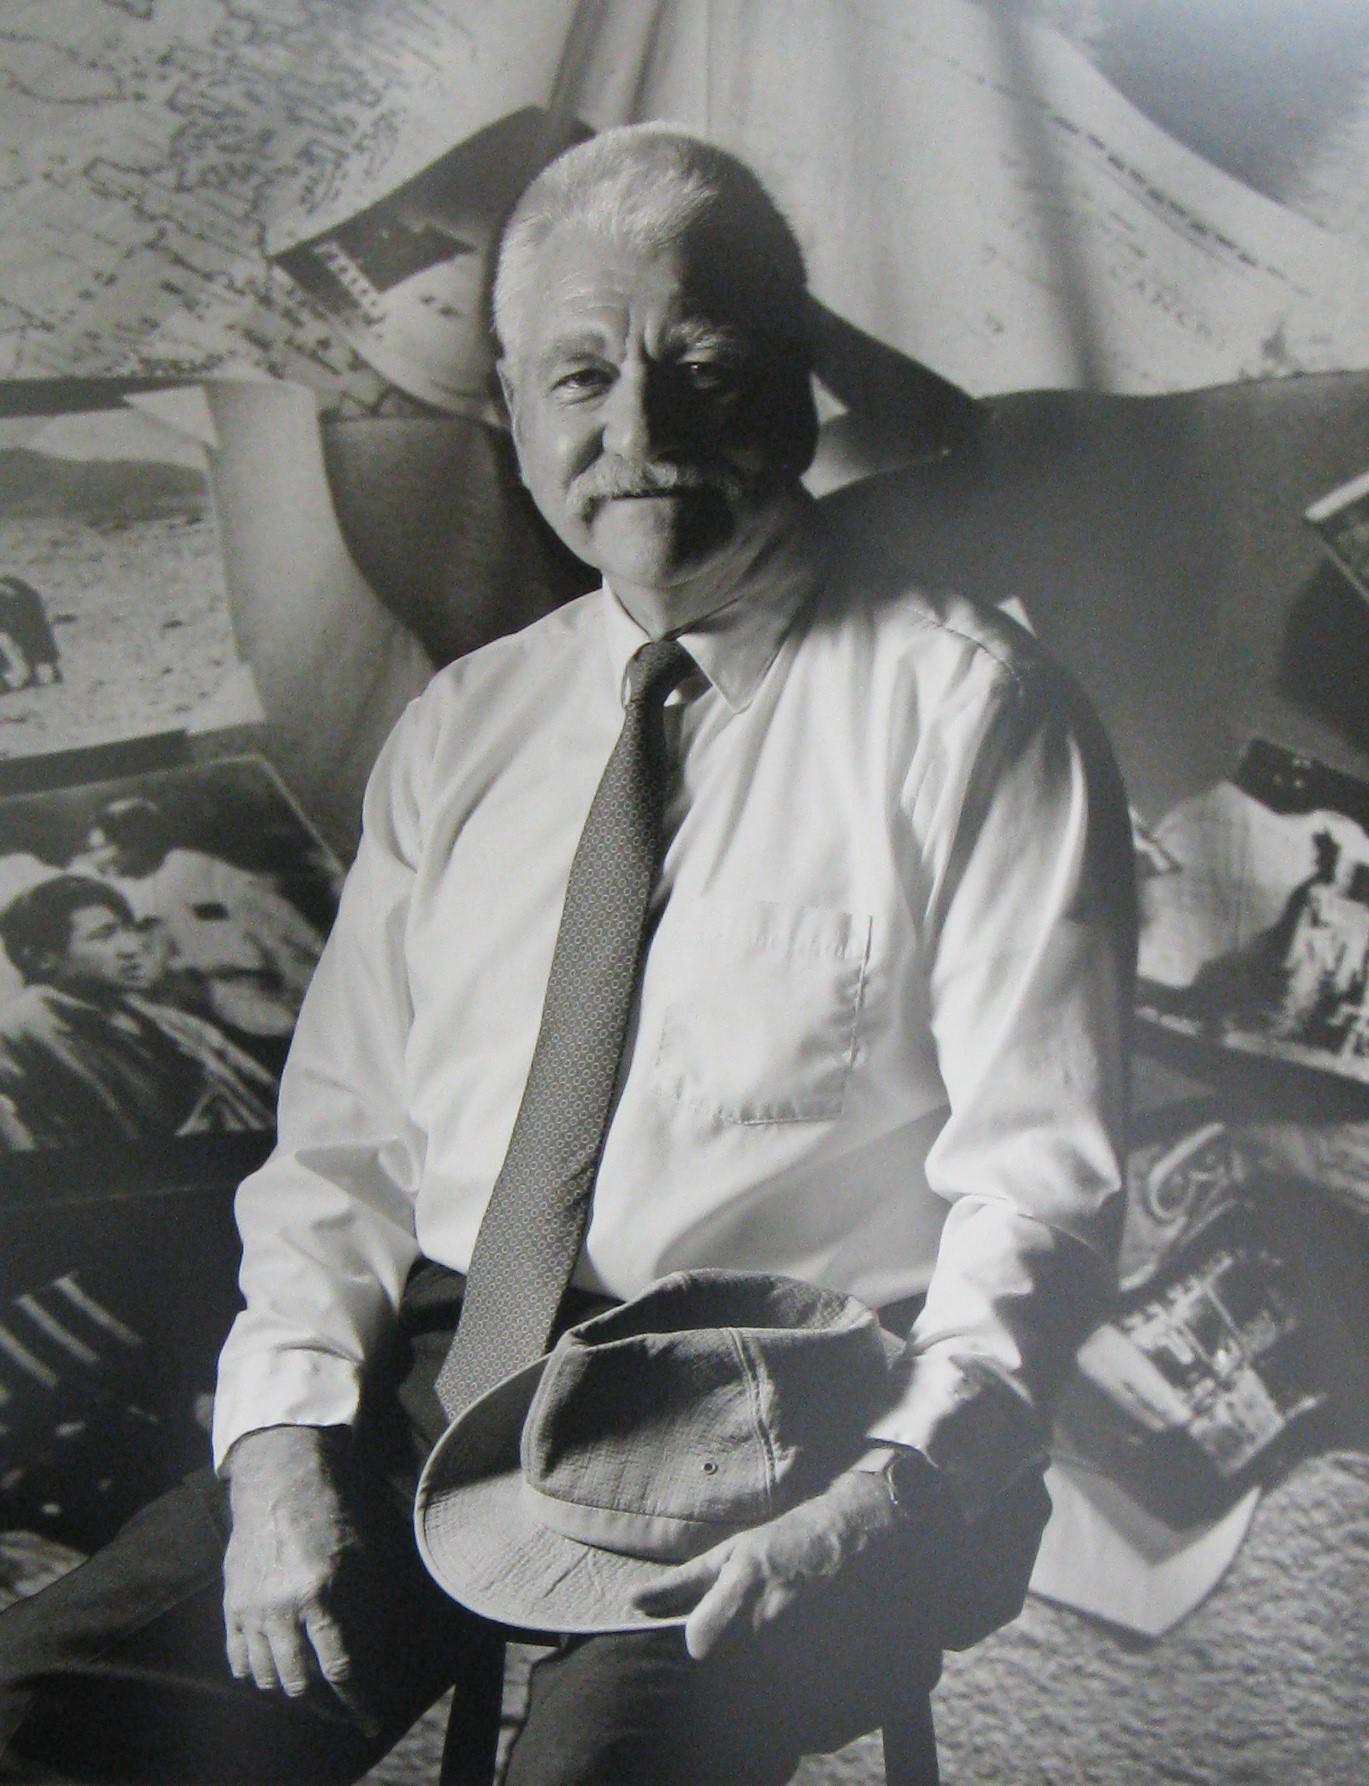 MOA founder Dr. E. Pendleton Banks